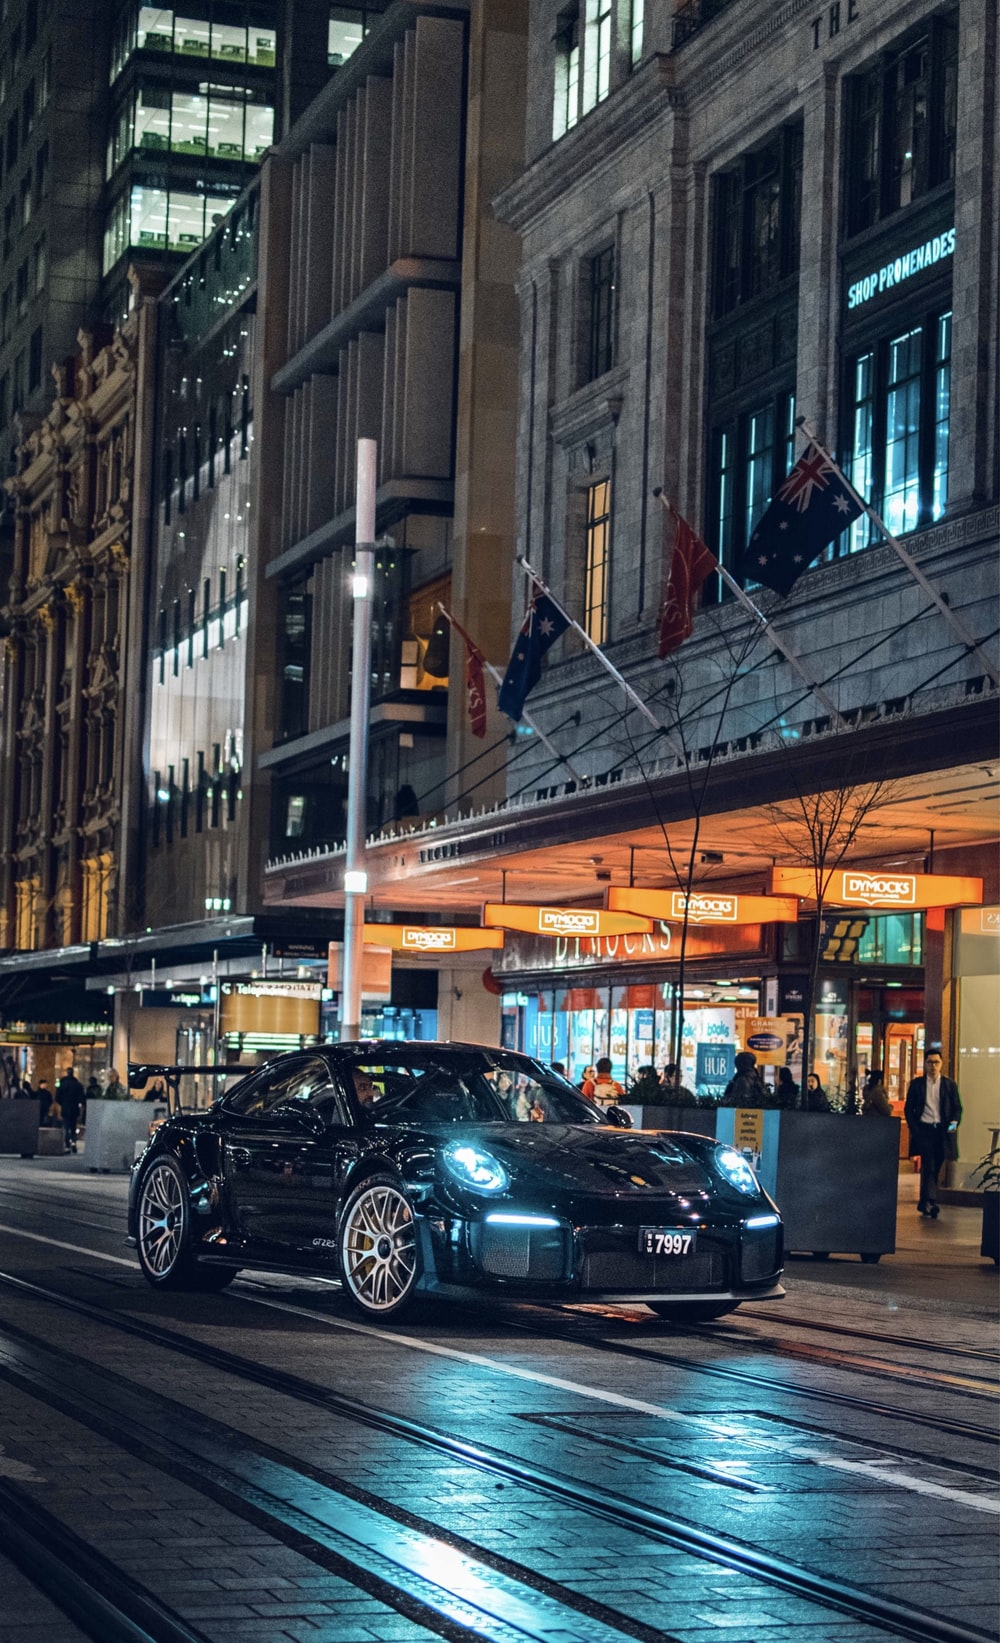 black car on paved road